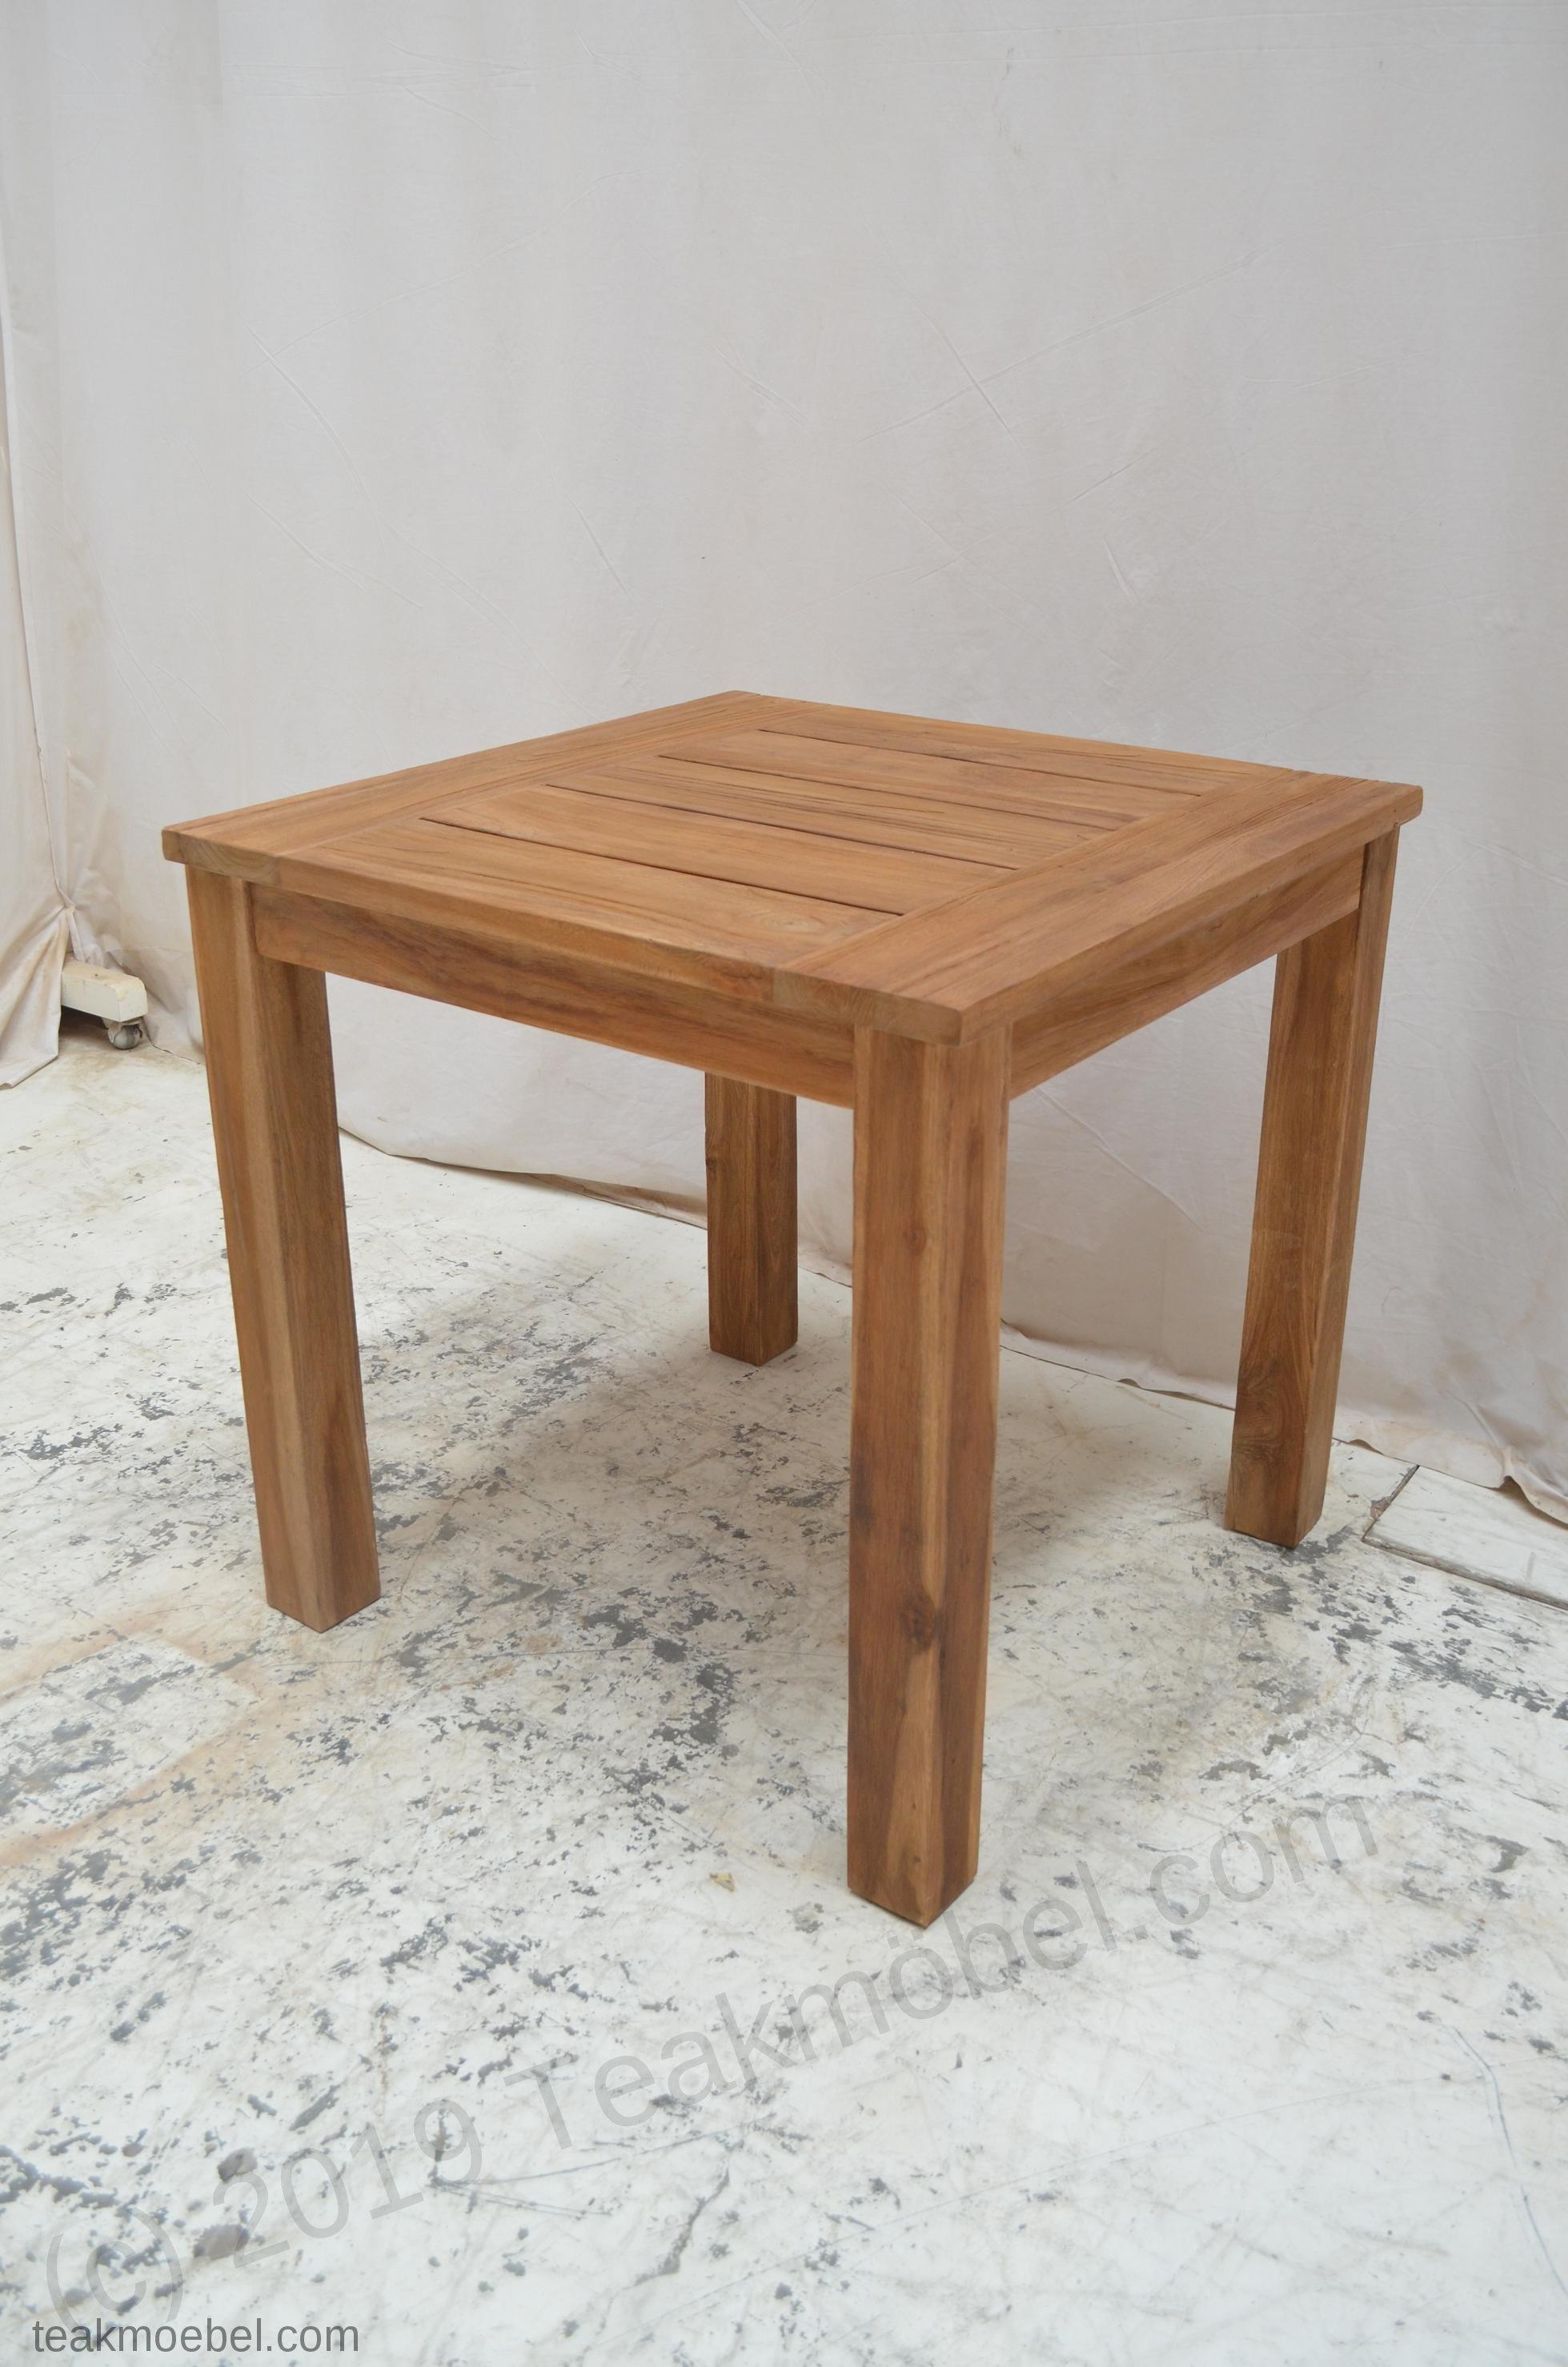 Gartentisch 80 X 140 Cool Jan Kurtz Giga Hpl X Cm Tisch With